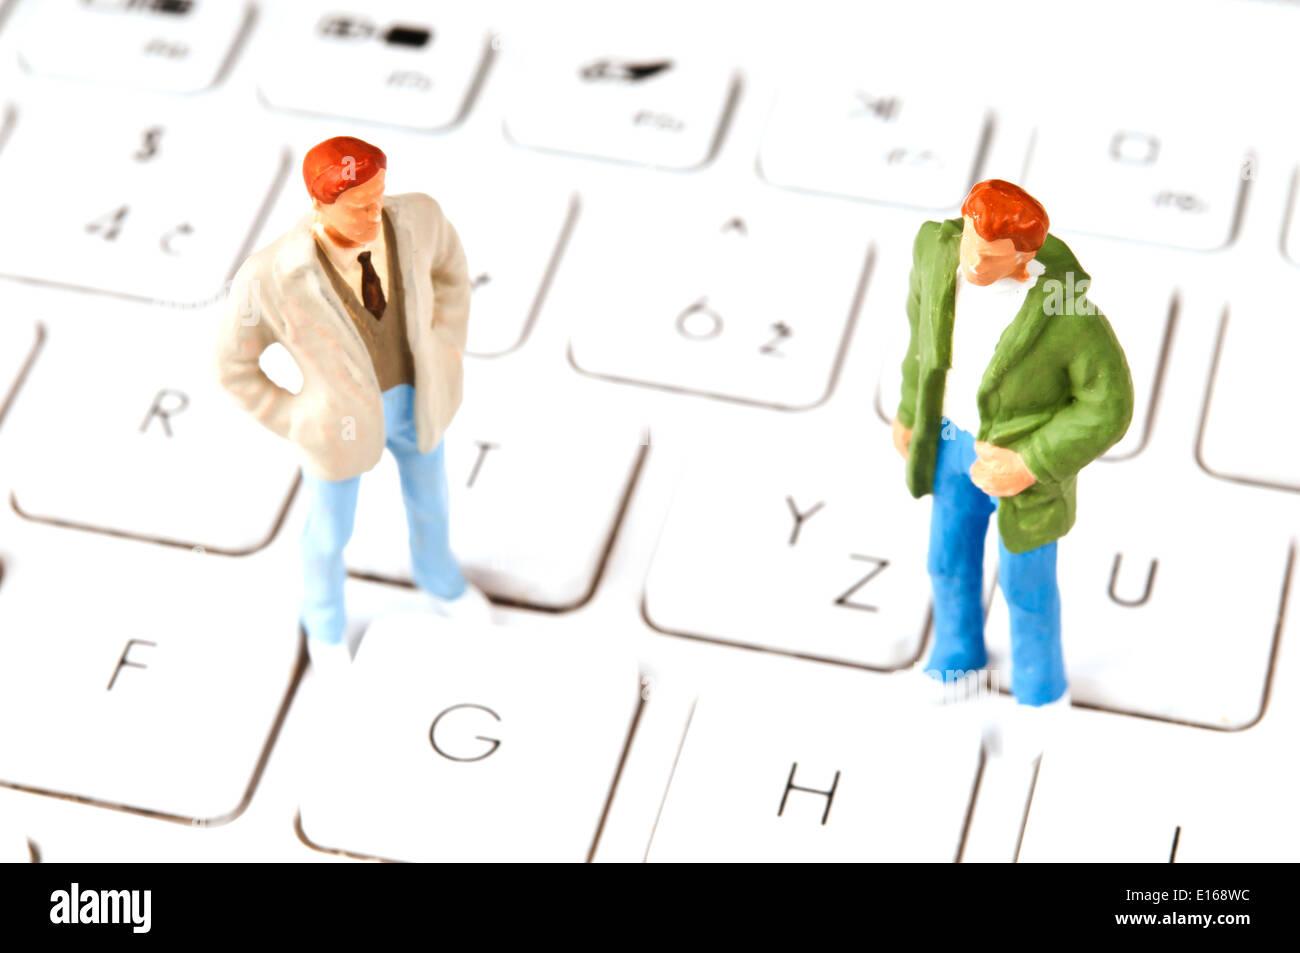 Gay dating – professional men seeking men with EliteSingles